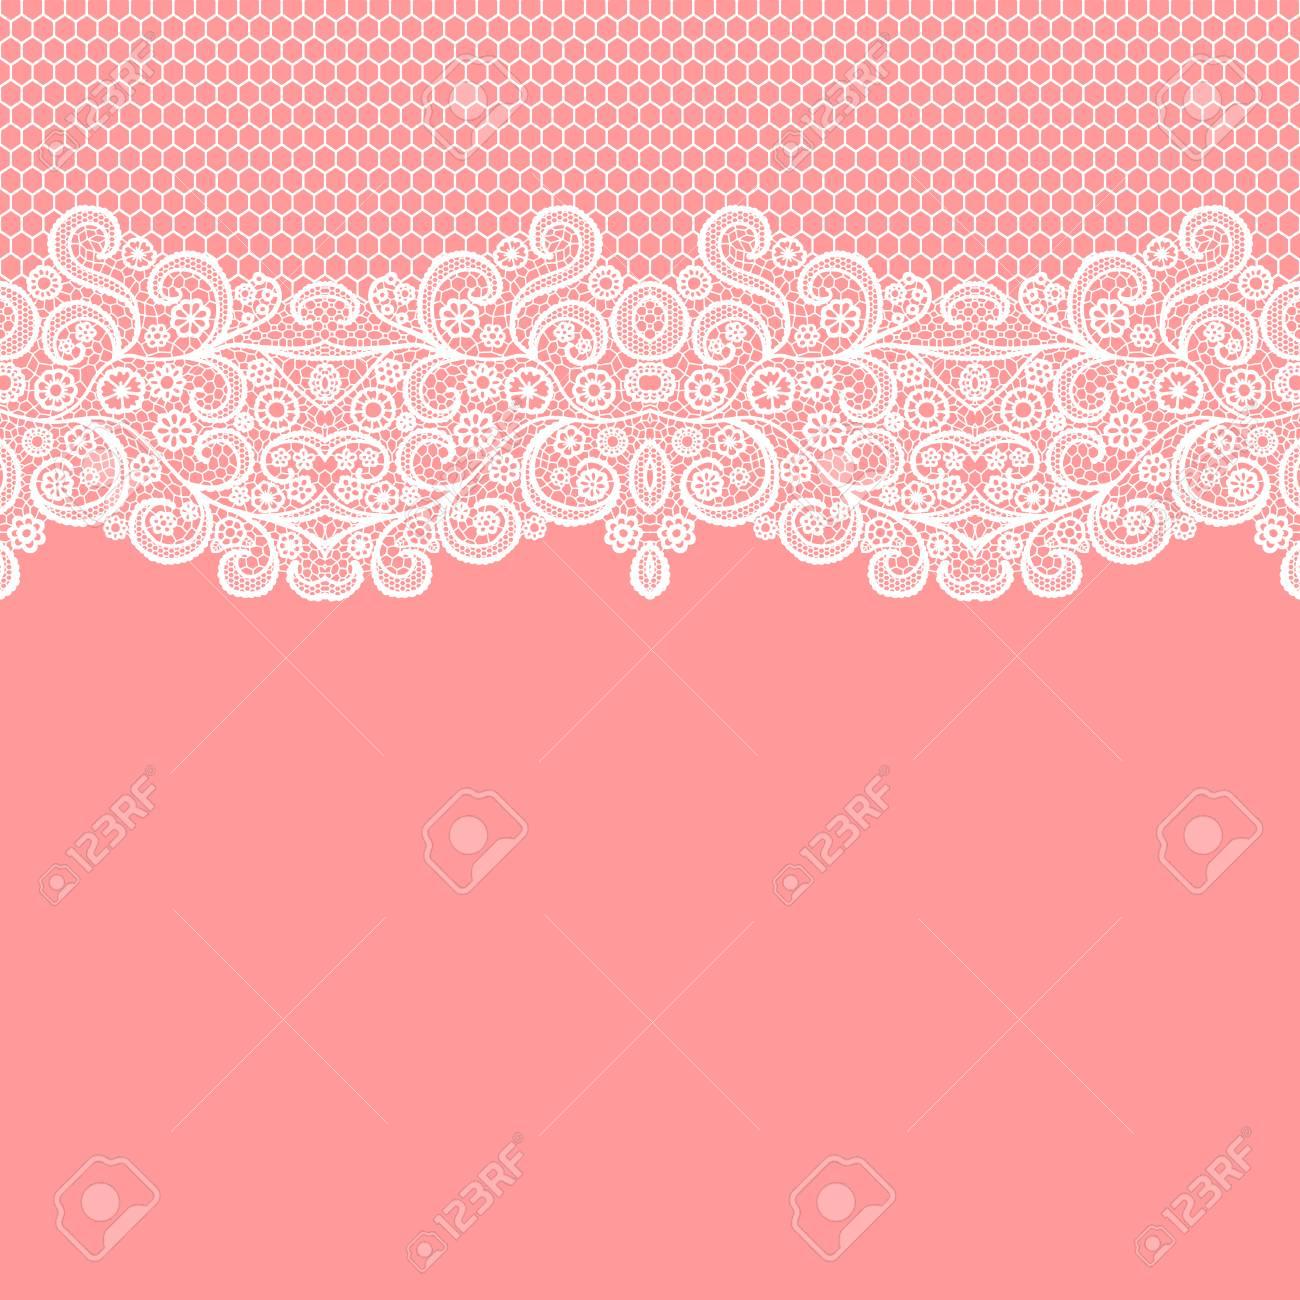 Seamless lace border. Vector illustration. White lacy vintage elegant trim. - 126826615